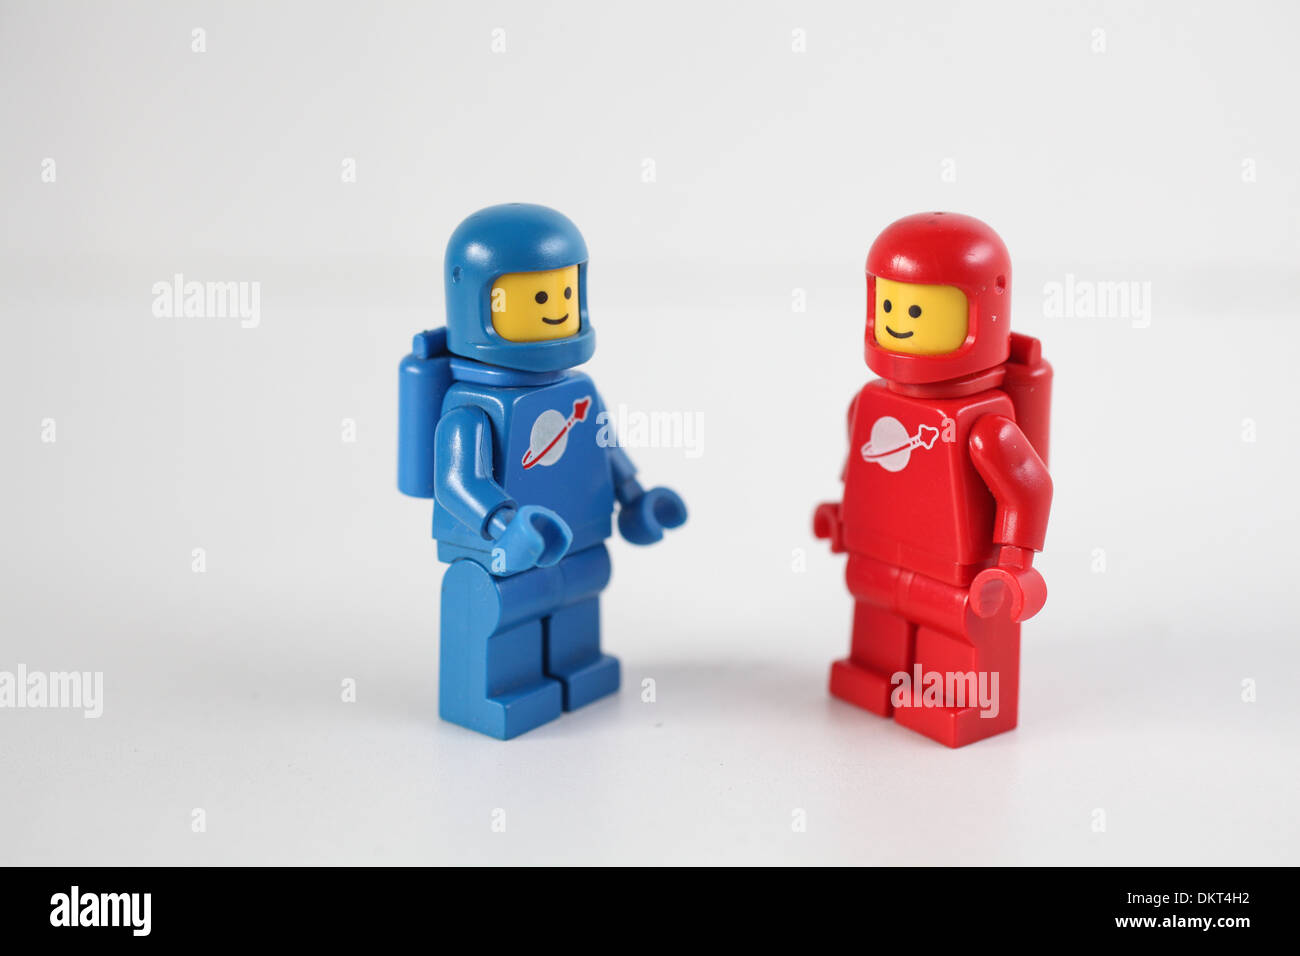 Lego Weltraum Figuren Stockfoto Bild 63840030 Alamy